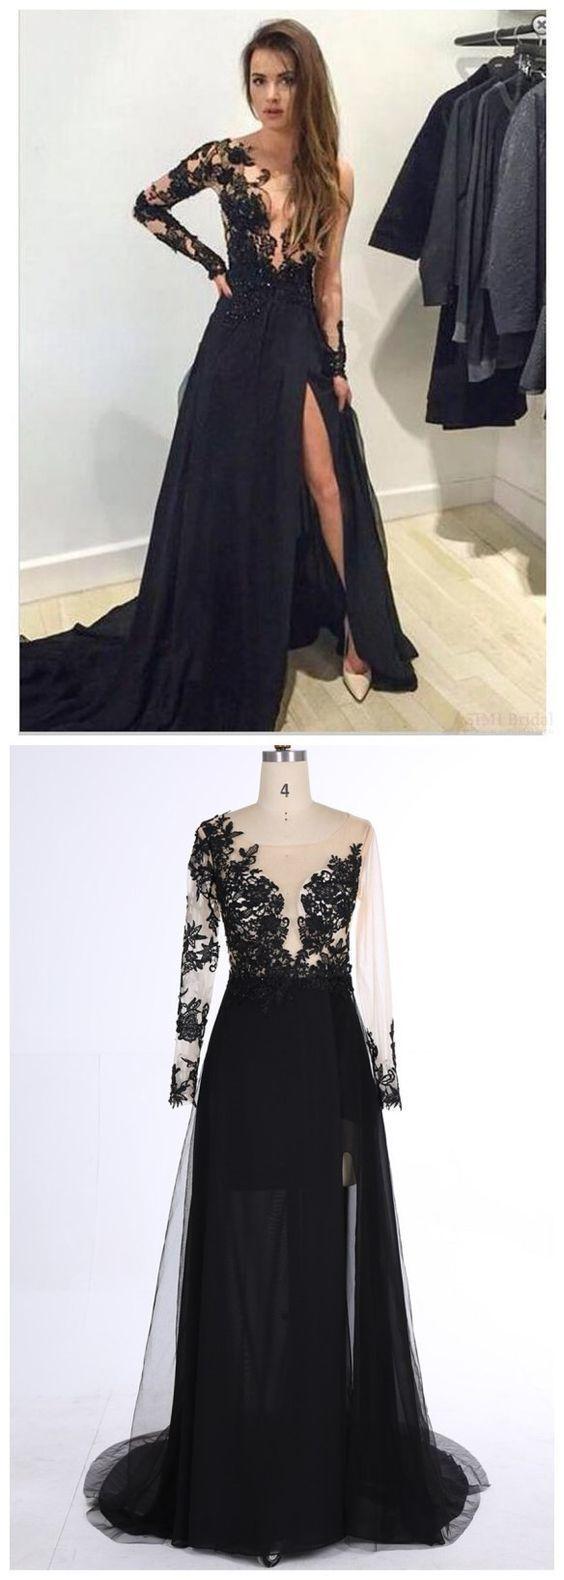 Charming prom dresslong sleeve prom dress formal evening dress